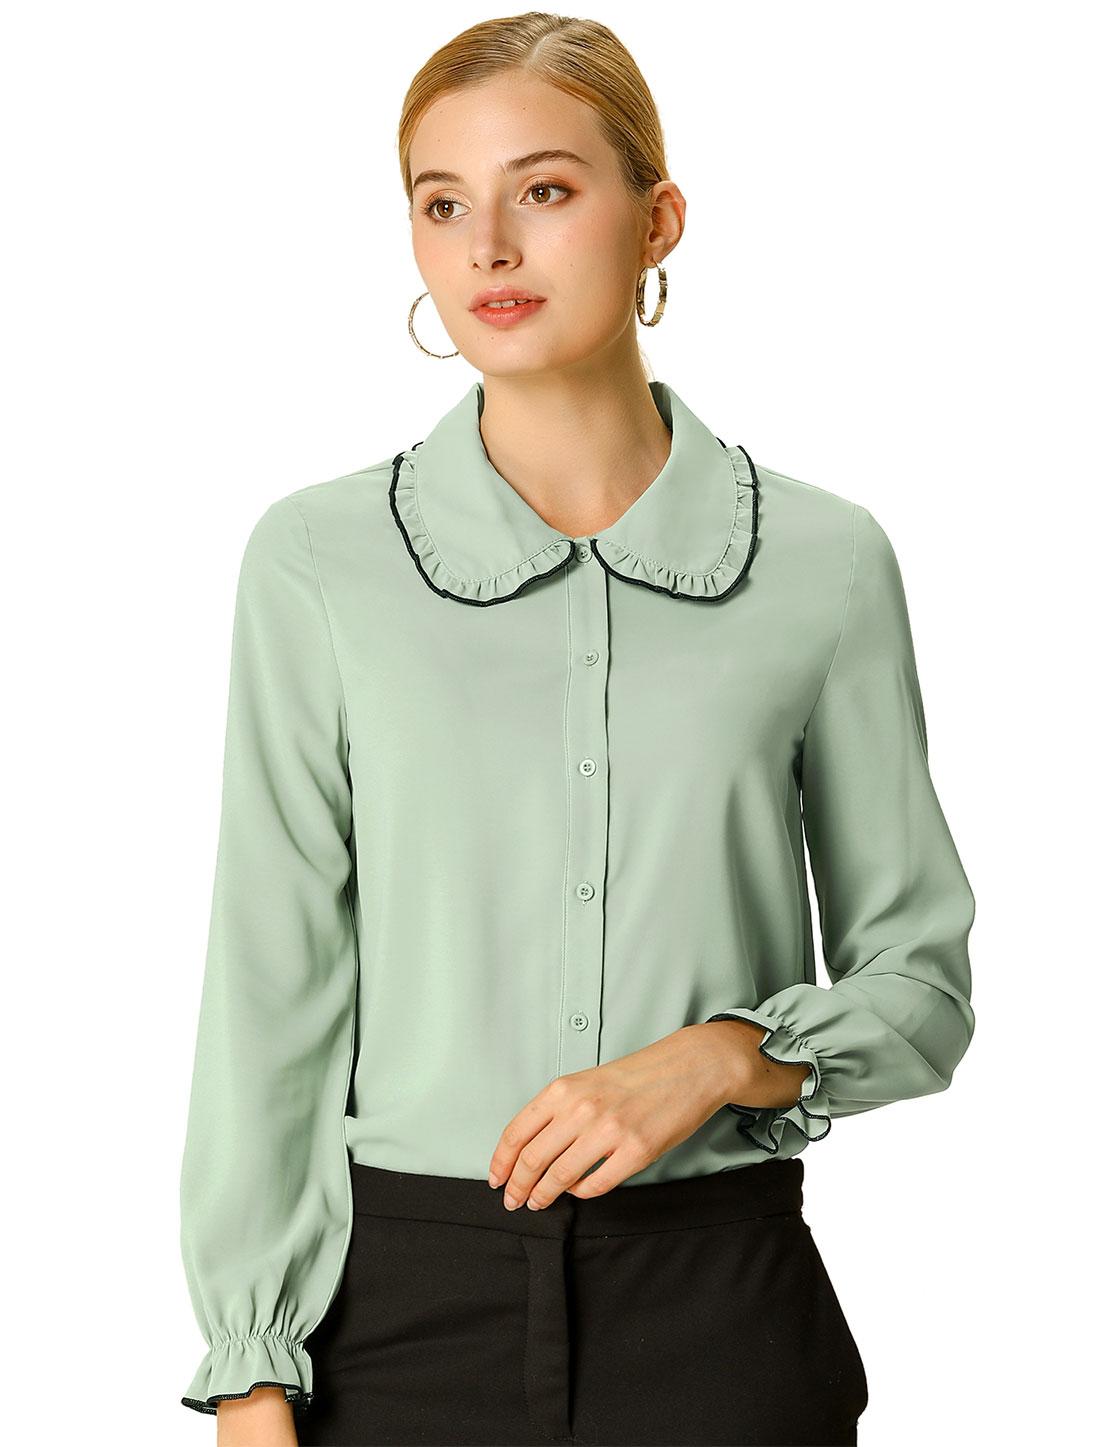 Women's Sweet Ruffle Peter Pan Collar Long Sleeves Button Up Shirt Green S